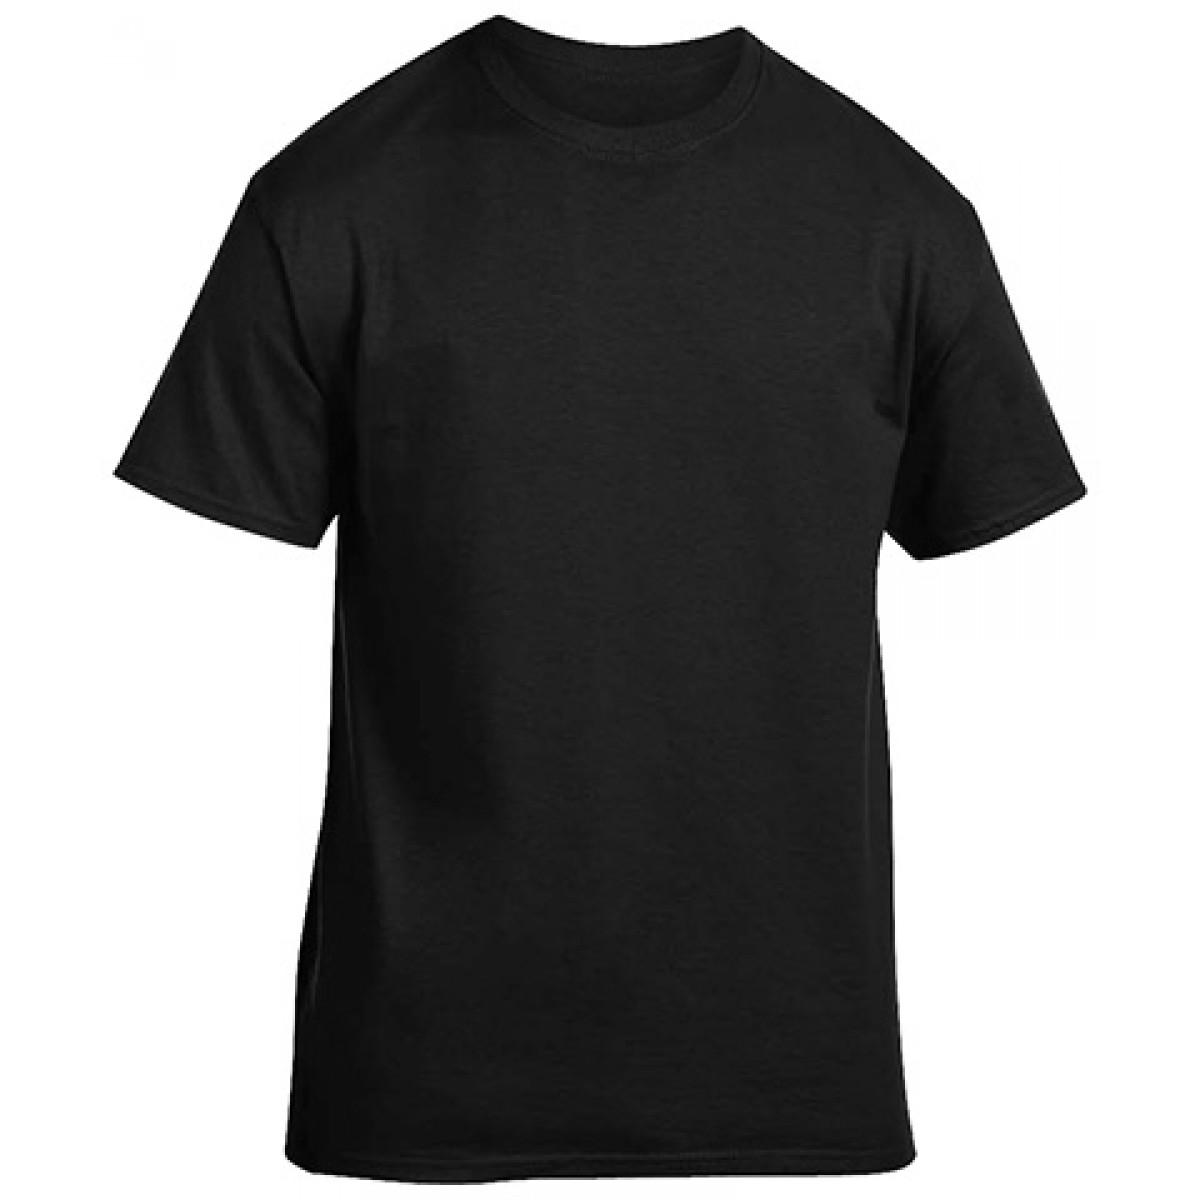 Cotton Short Sleeve T-Shirt-Black-XL